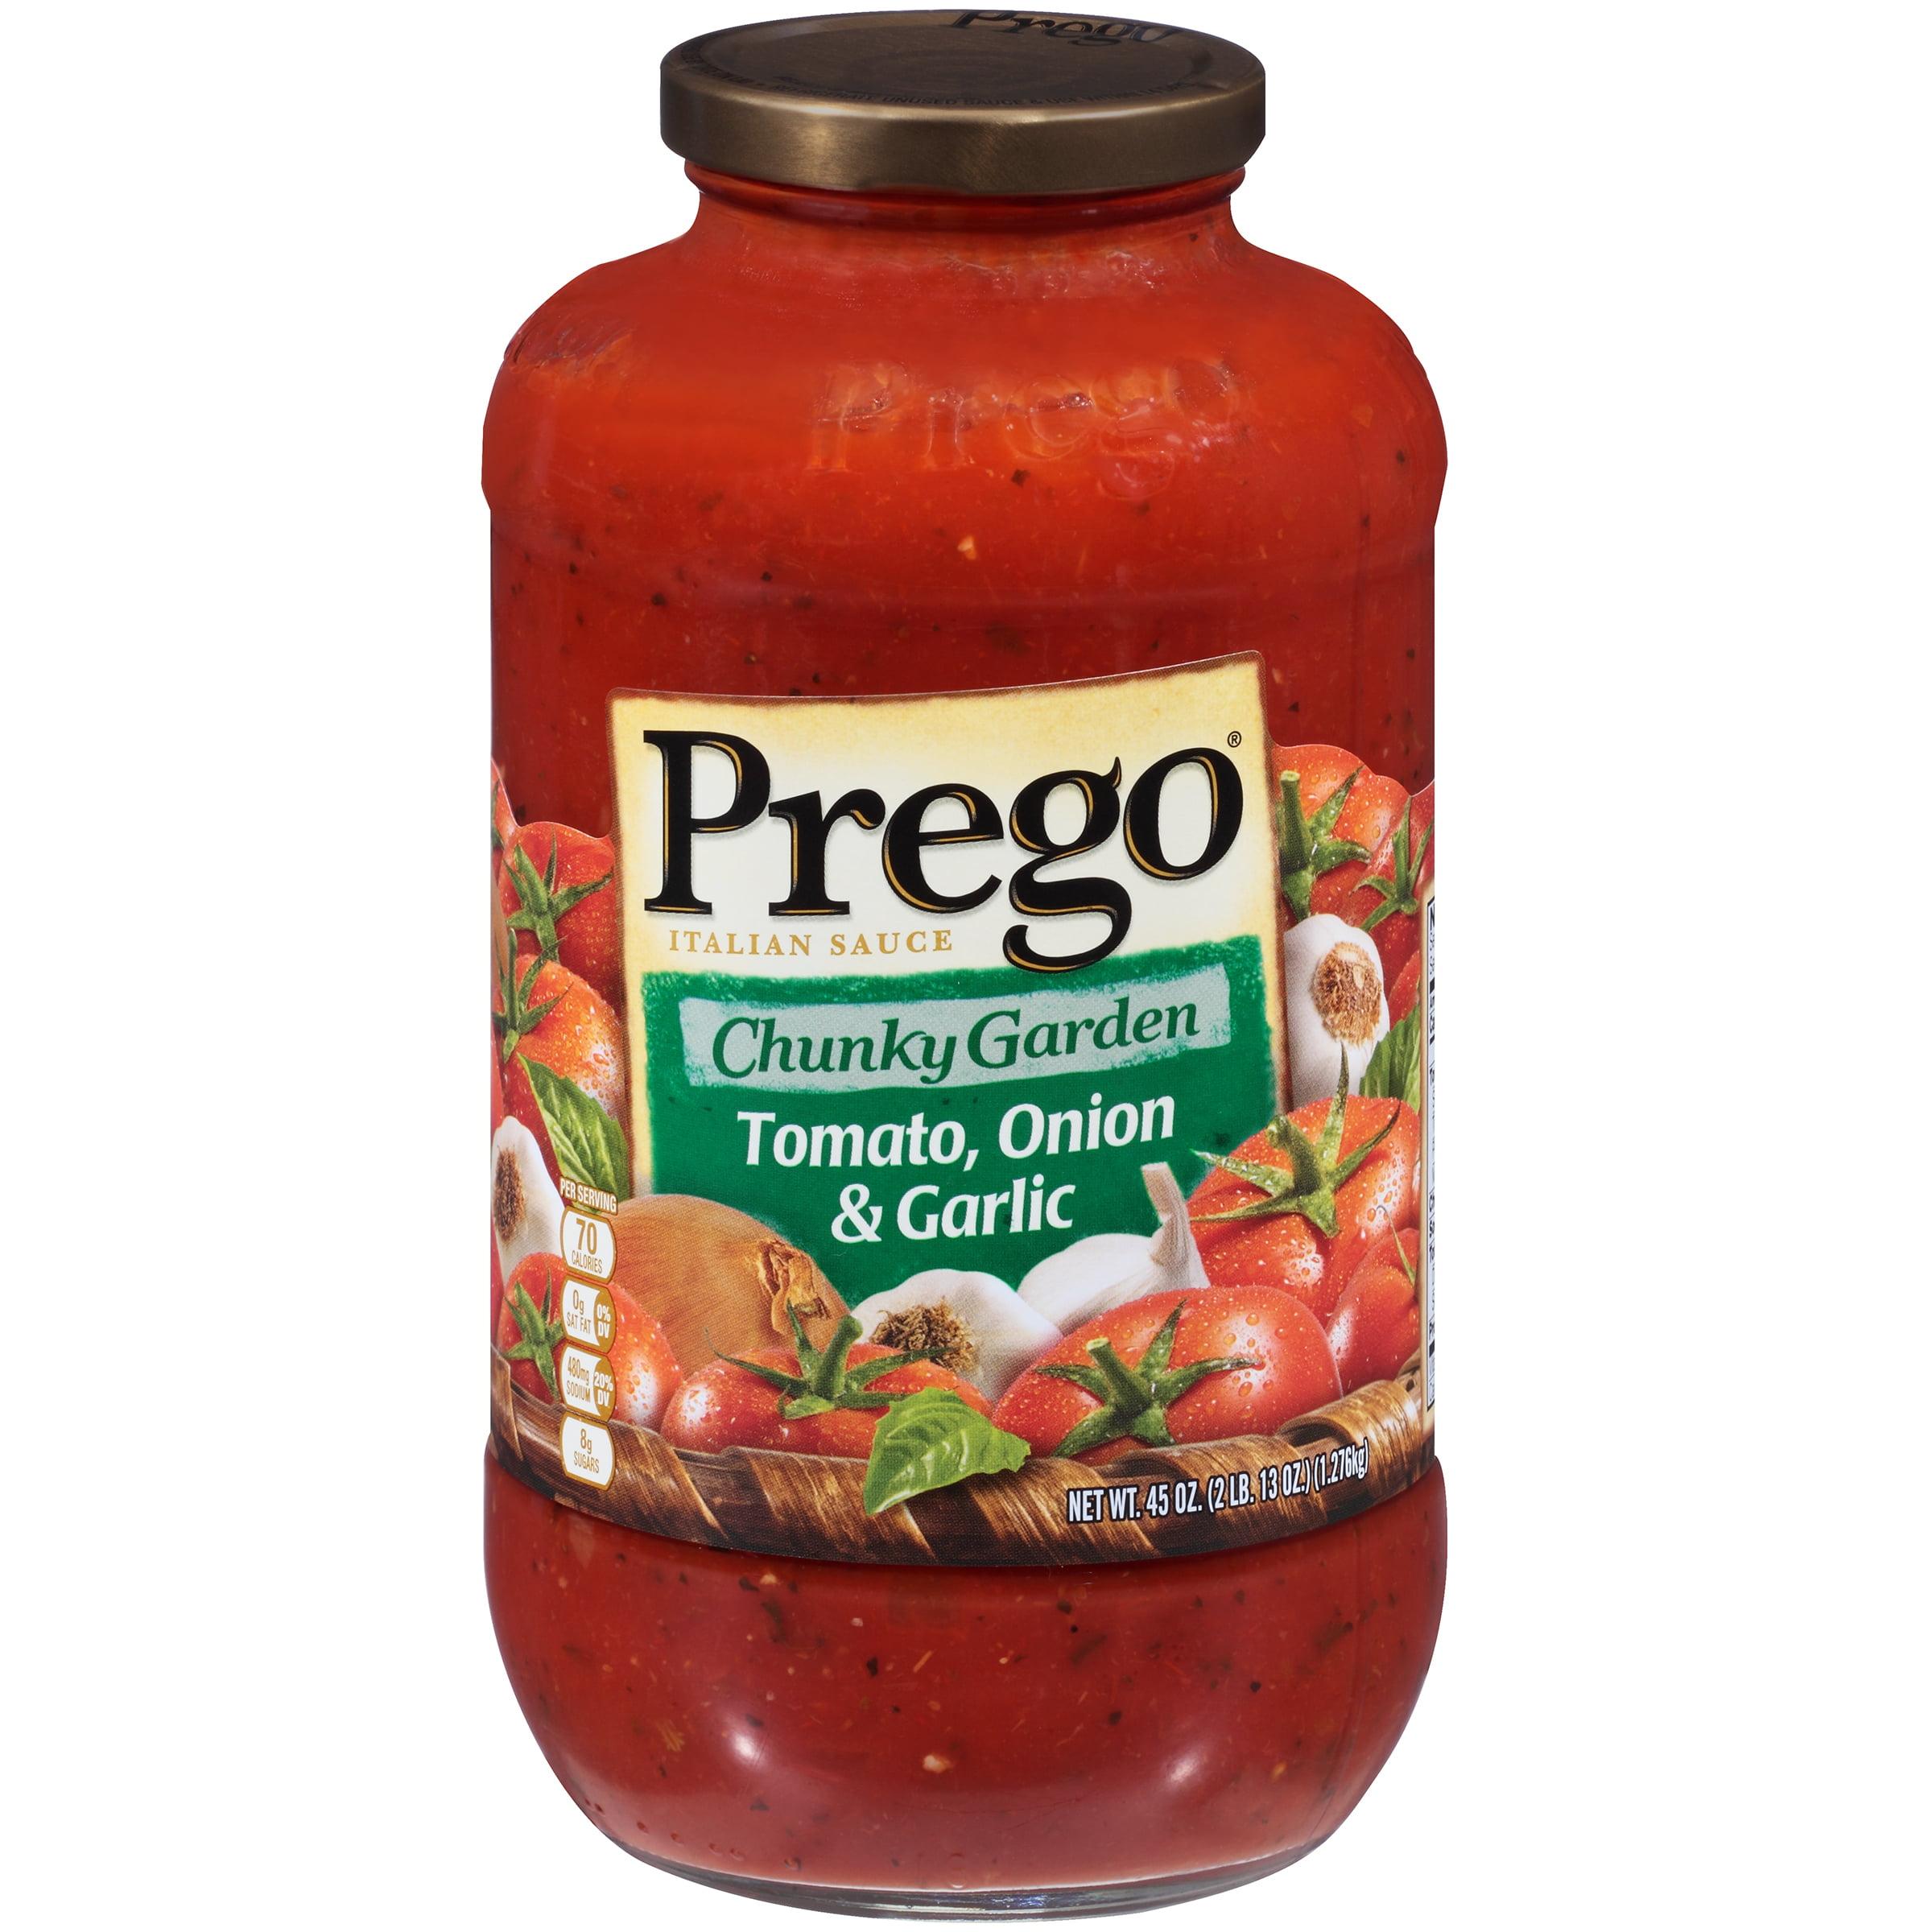 Prego Chunky Garden Tomato, Onion & Garlic Italian Sauce 45oz